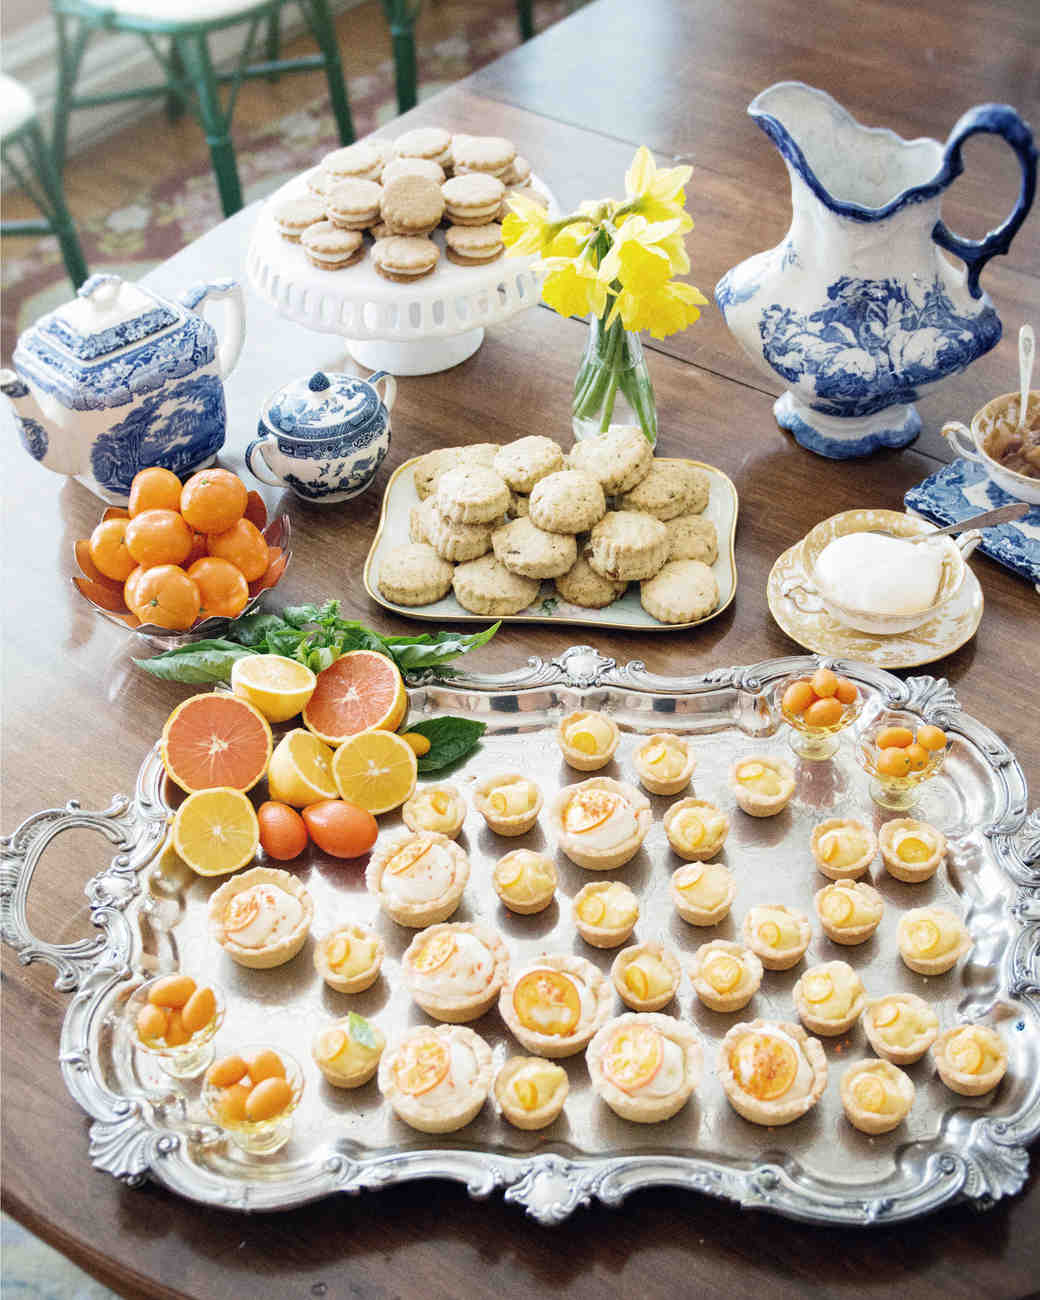 scavenger-hunt-bridal-shower-mini-quiches-macarons-tea-0315.jpg